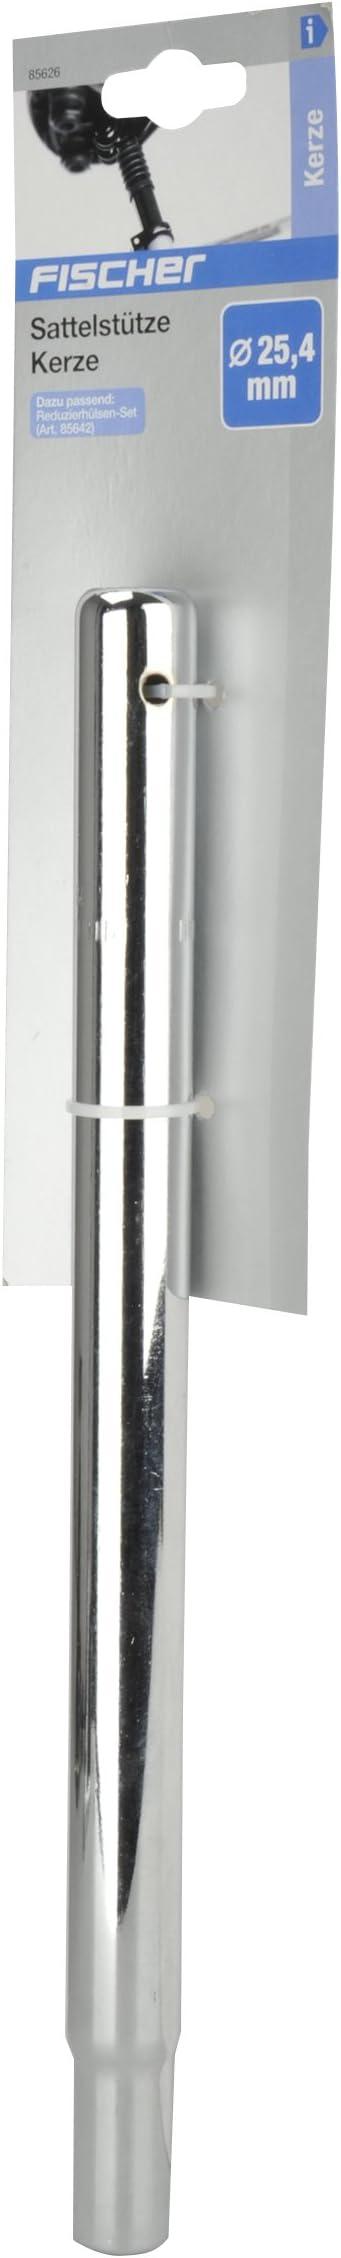 Silber One Size Fischer Kerze 25,4 mm Sattelstützen